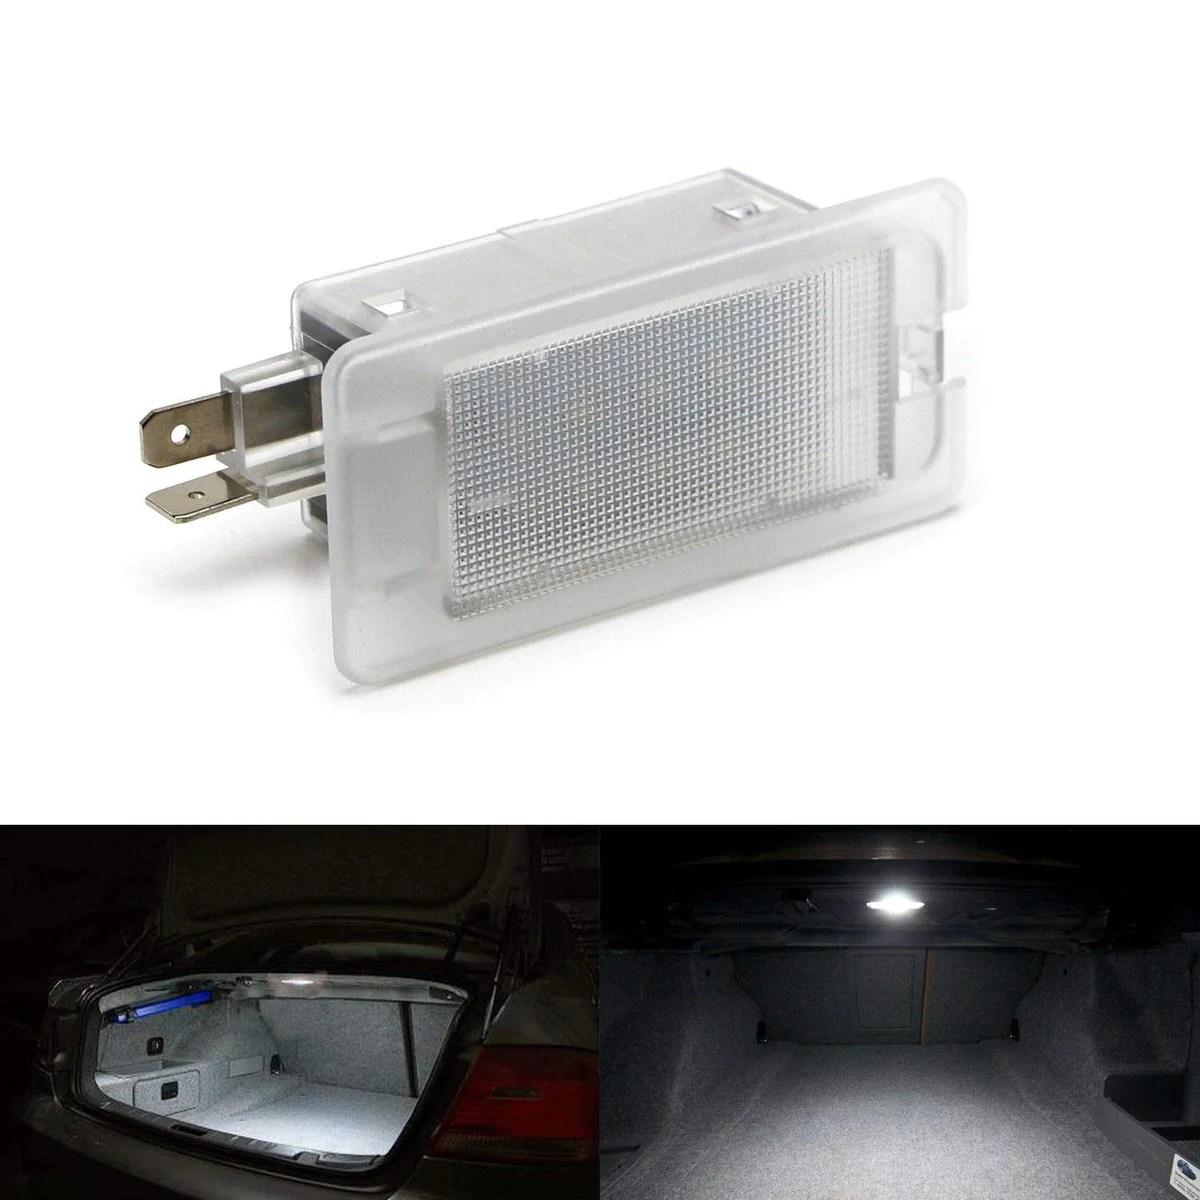 xenon white led trunk glove box light for hyundai accent elantra genesis coupe sonata kia optima forte rio k900 etc great as oem replacement powered by  [ 1200 x 1200 Pixel ]